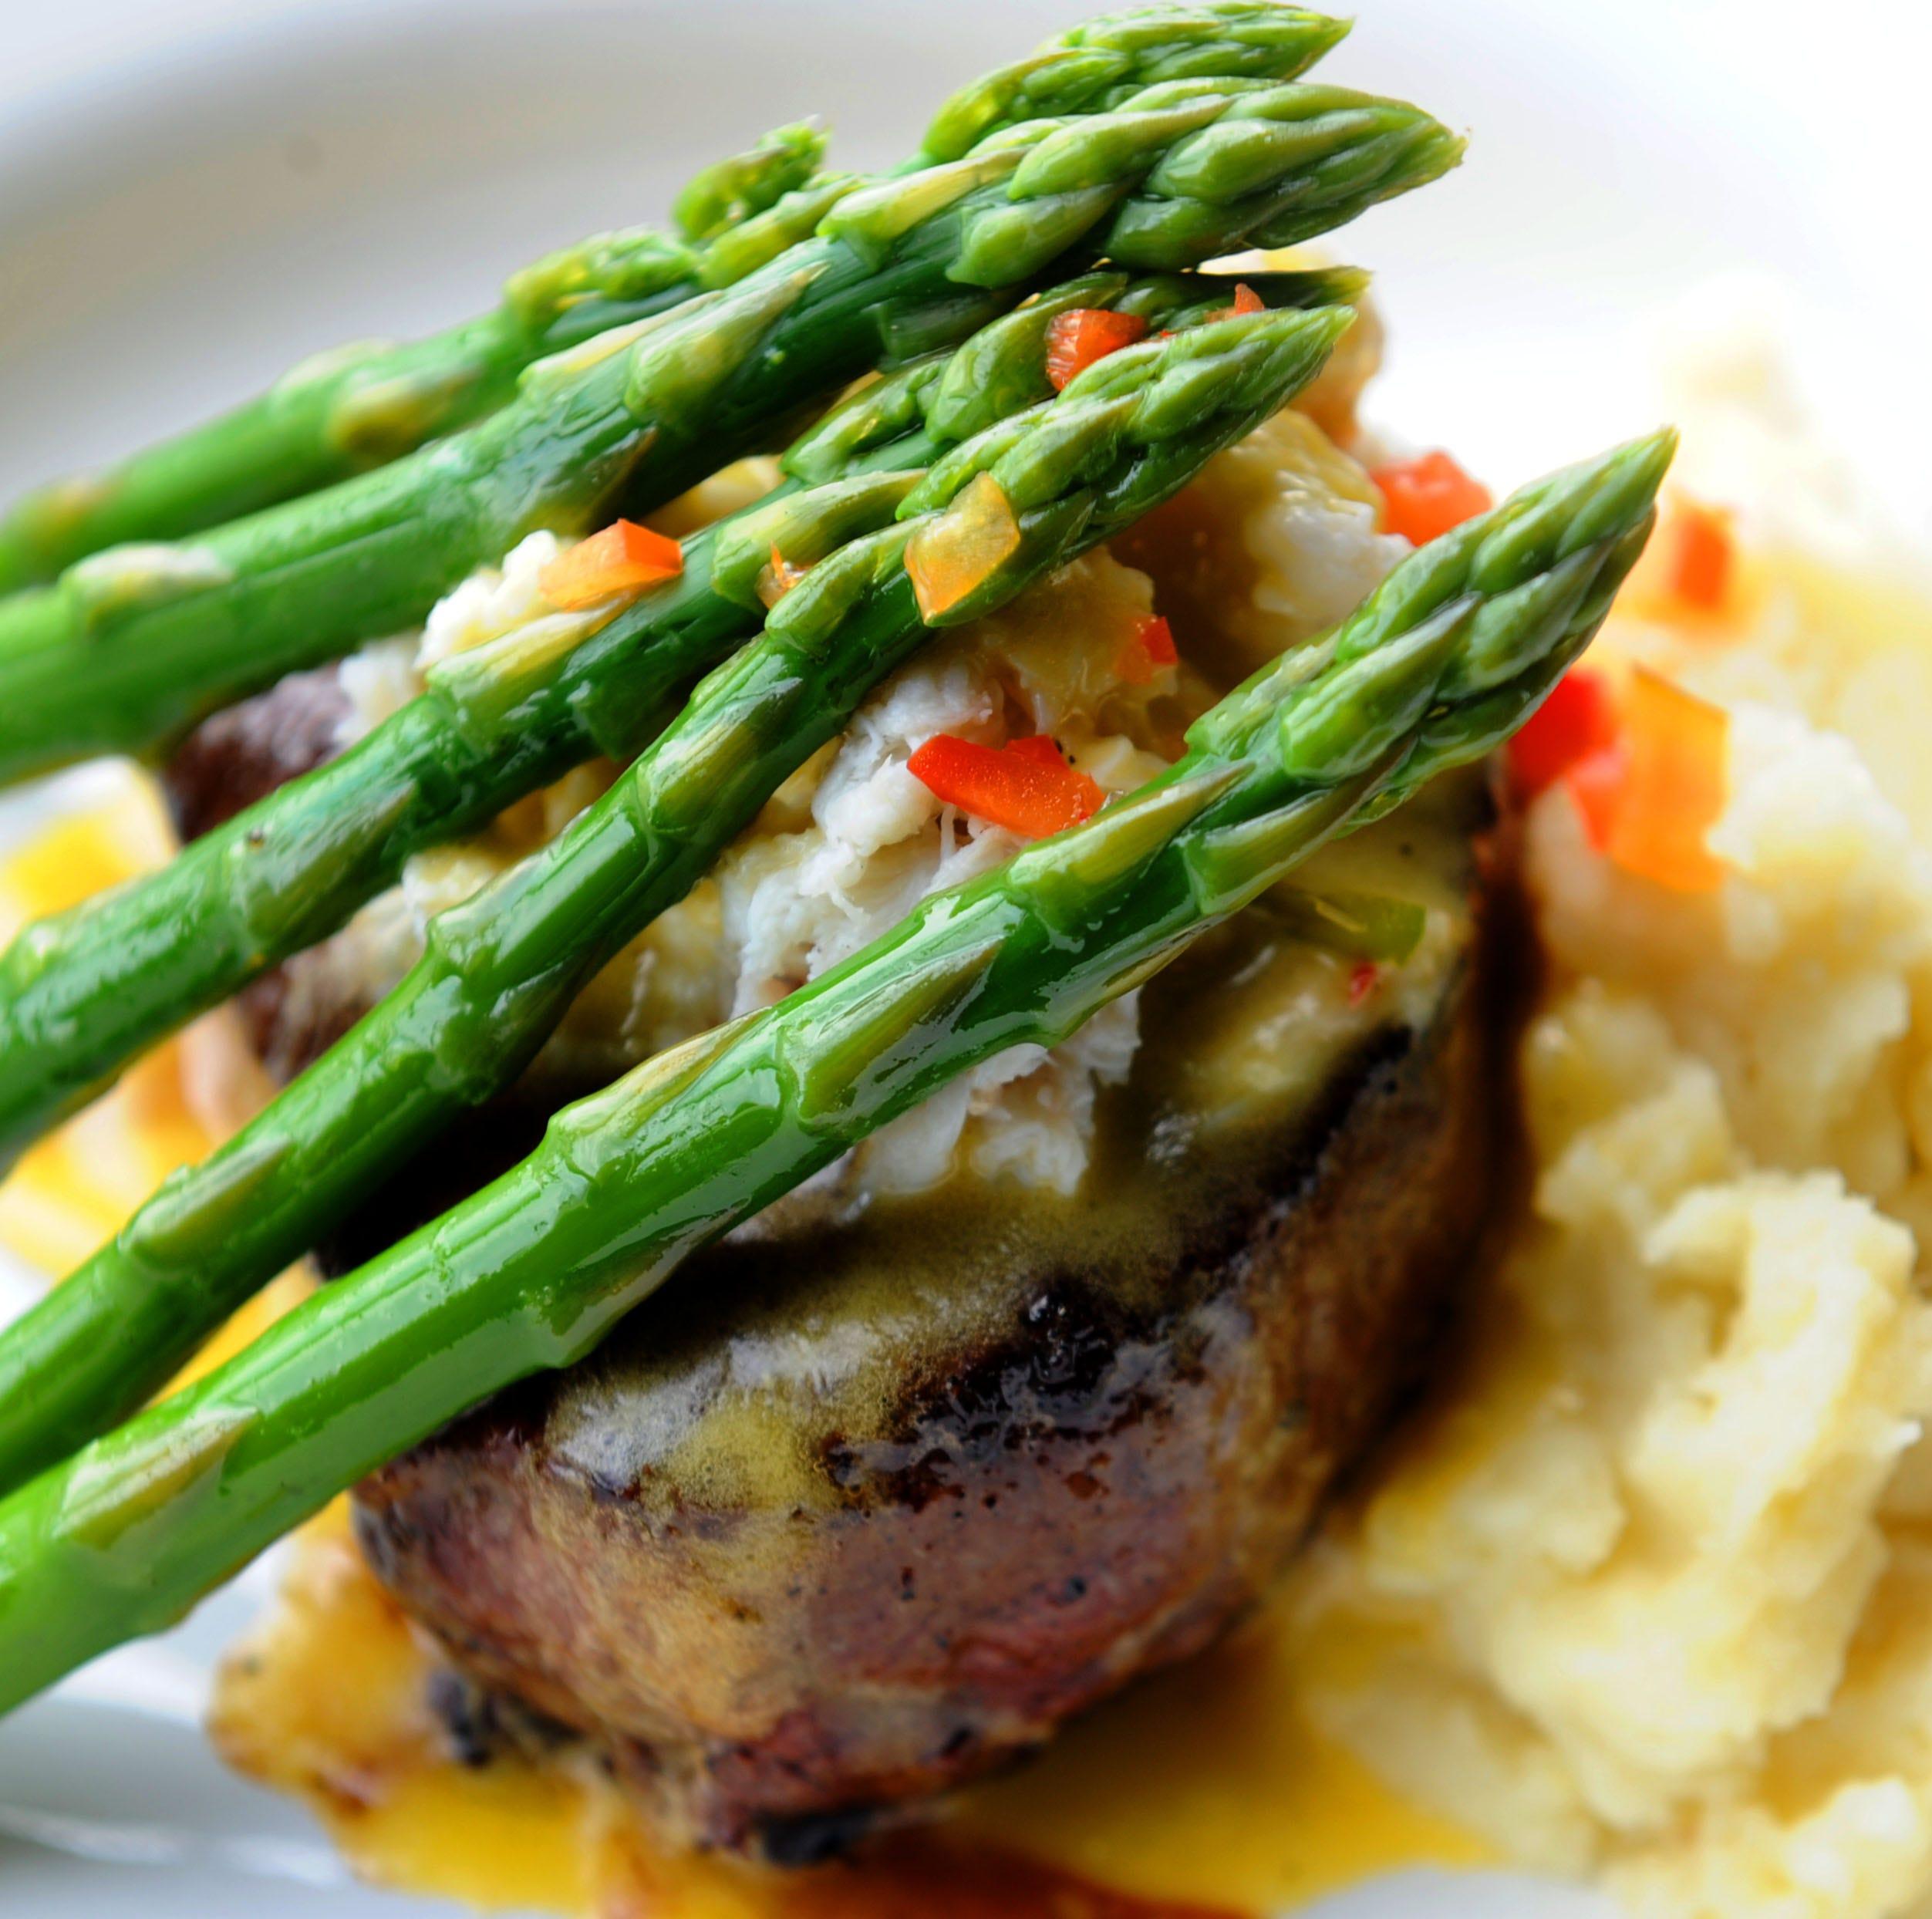 Oxnard's Salt Waterside Bistro offers dishes that entice, satisfy